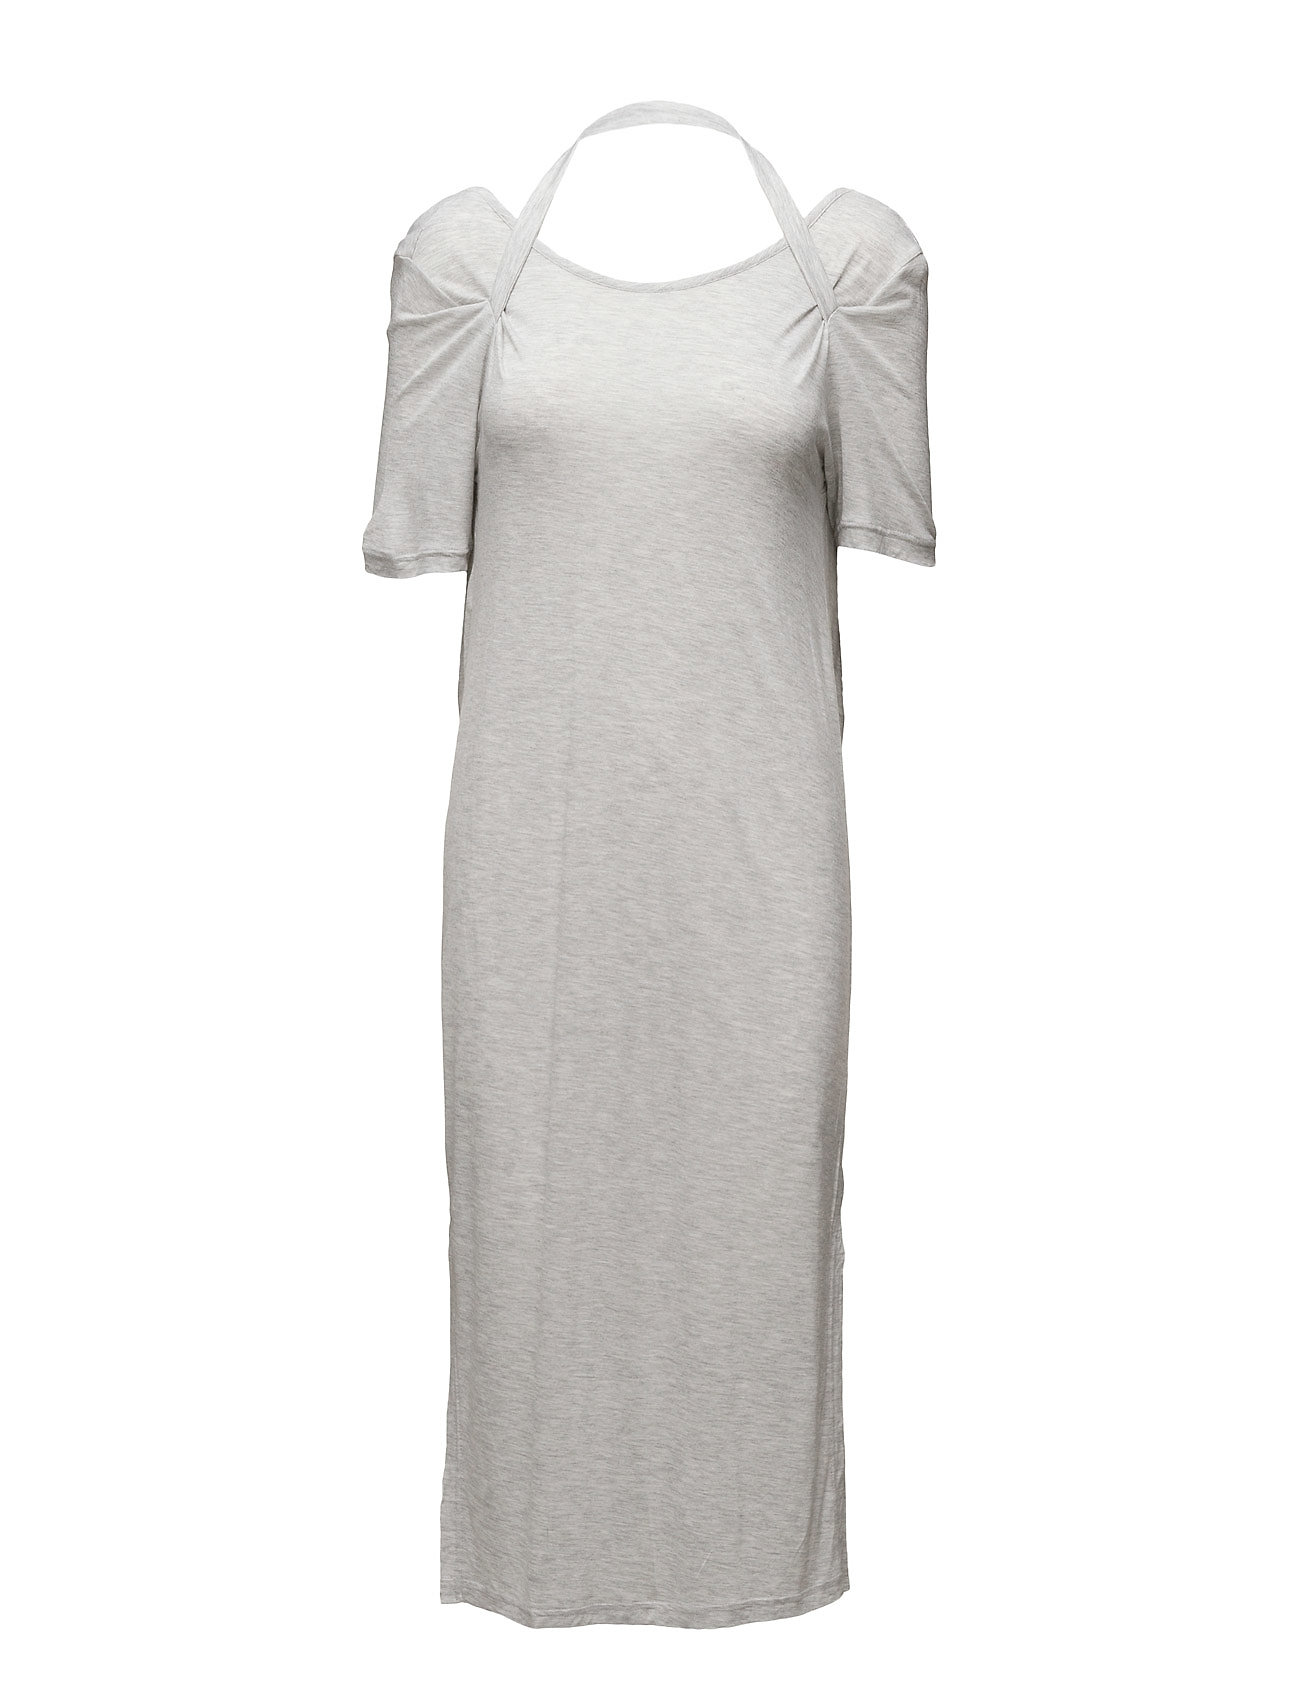 Sway Dress Cheap Monday Kjoler til Kvinder i